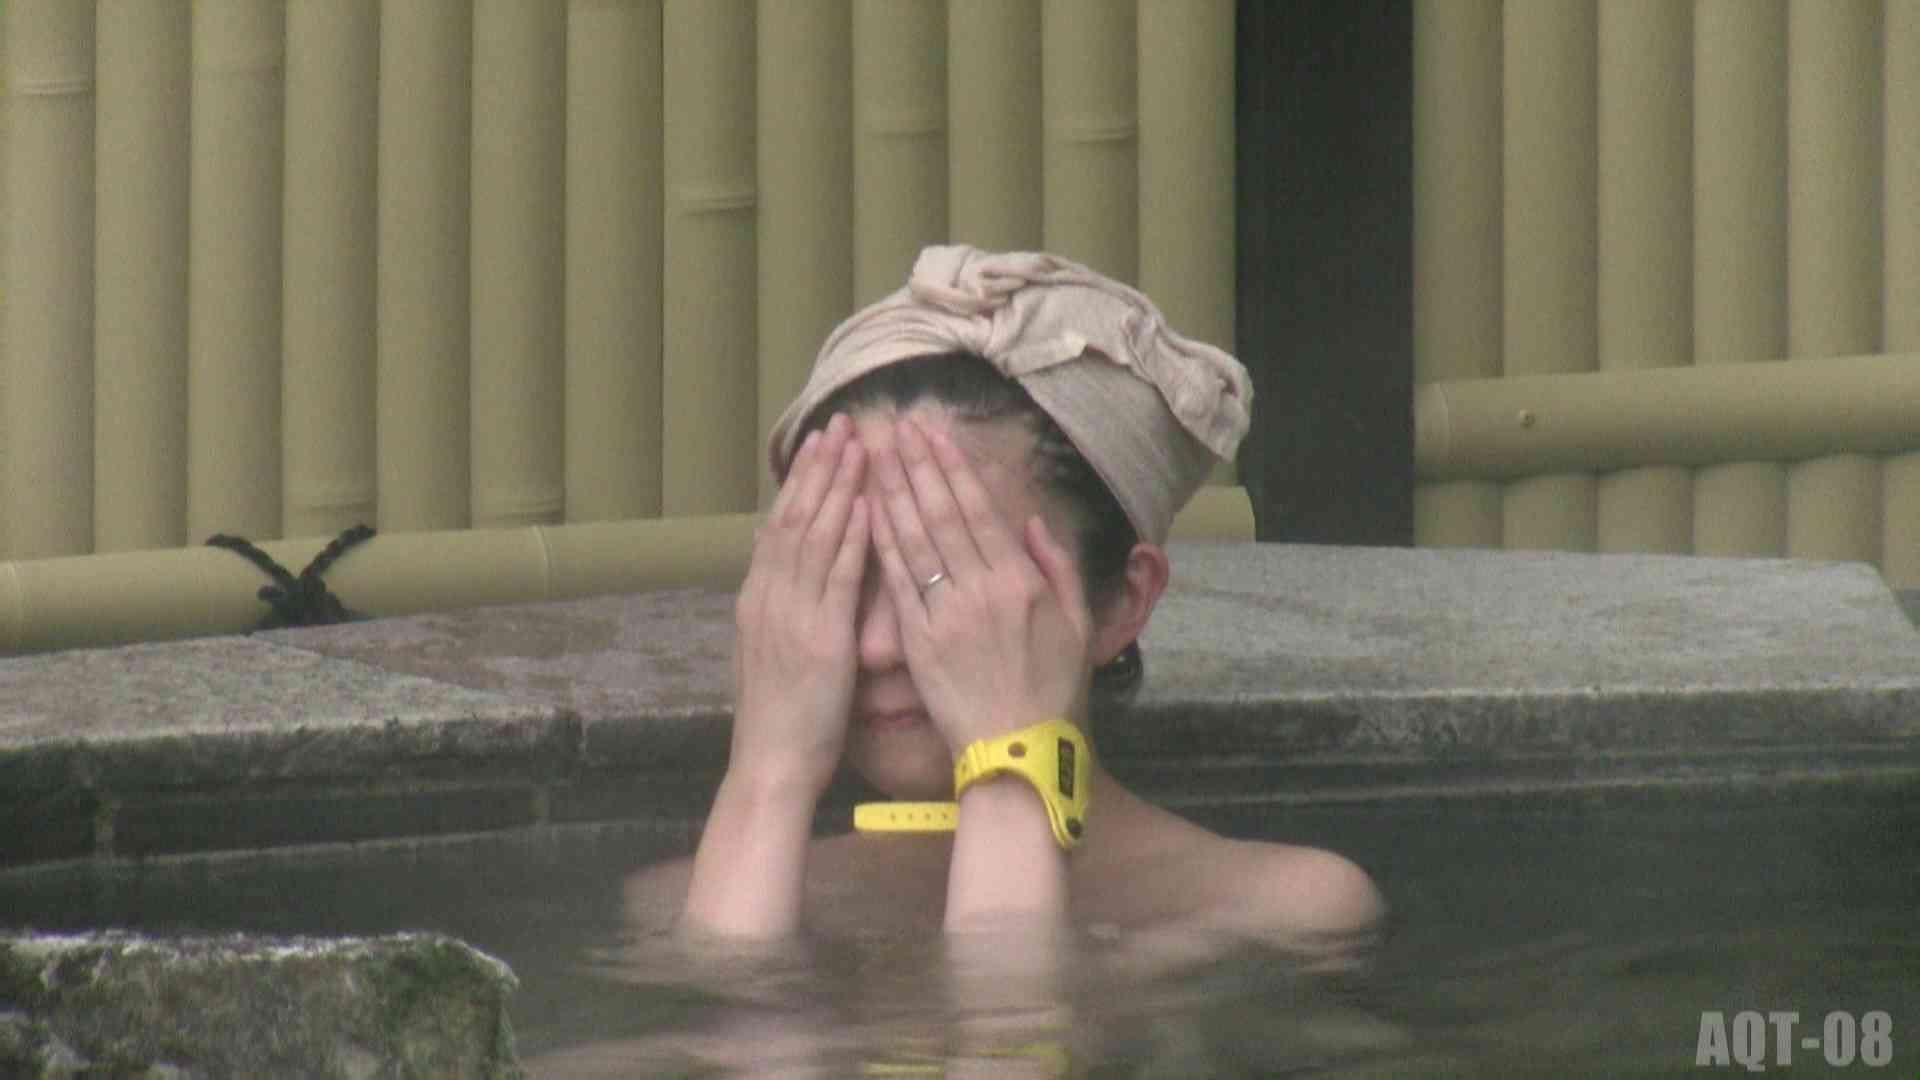 Aquaな露天風呂Vol.772 いやらしいOL のぞき動画キャプチャ 50連発 27